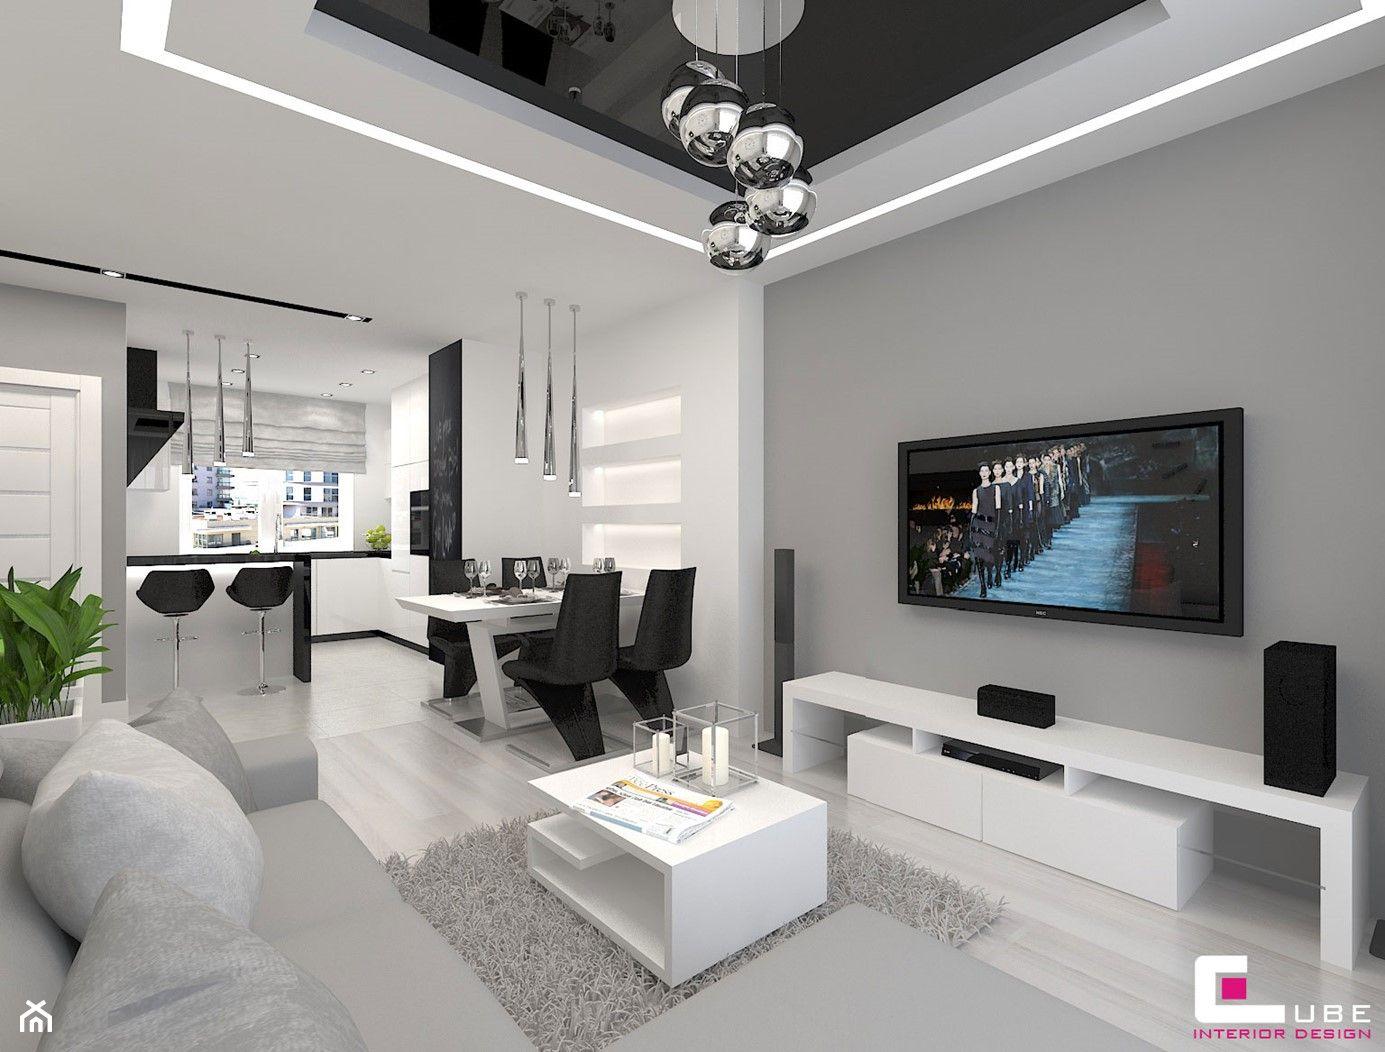 Salon Z Kuchnia Aranzacje Pomysly Inspiracje Strona 2 Homebook Contemporary Decor Living Room Living Room Decor Apartment Home Room Design